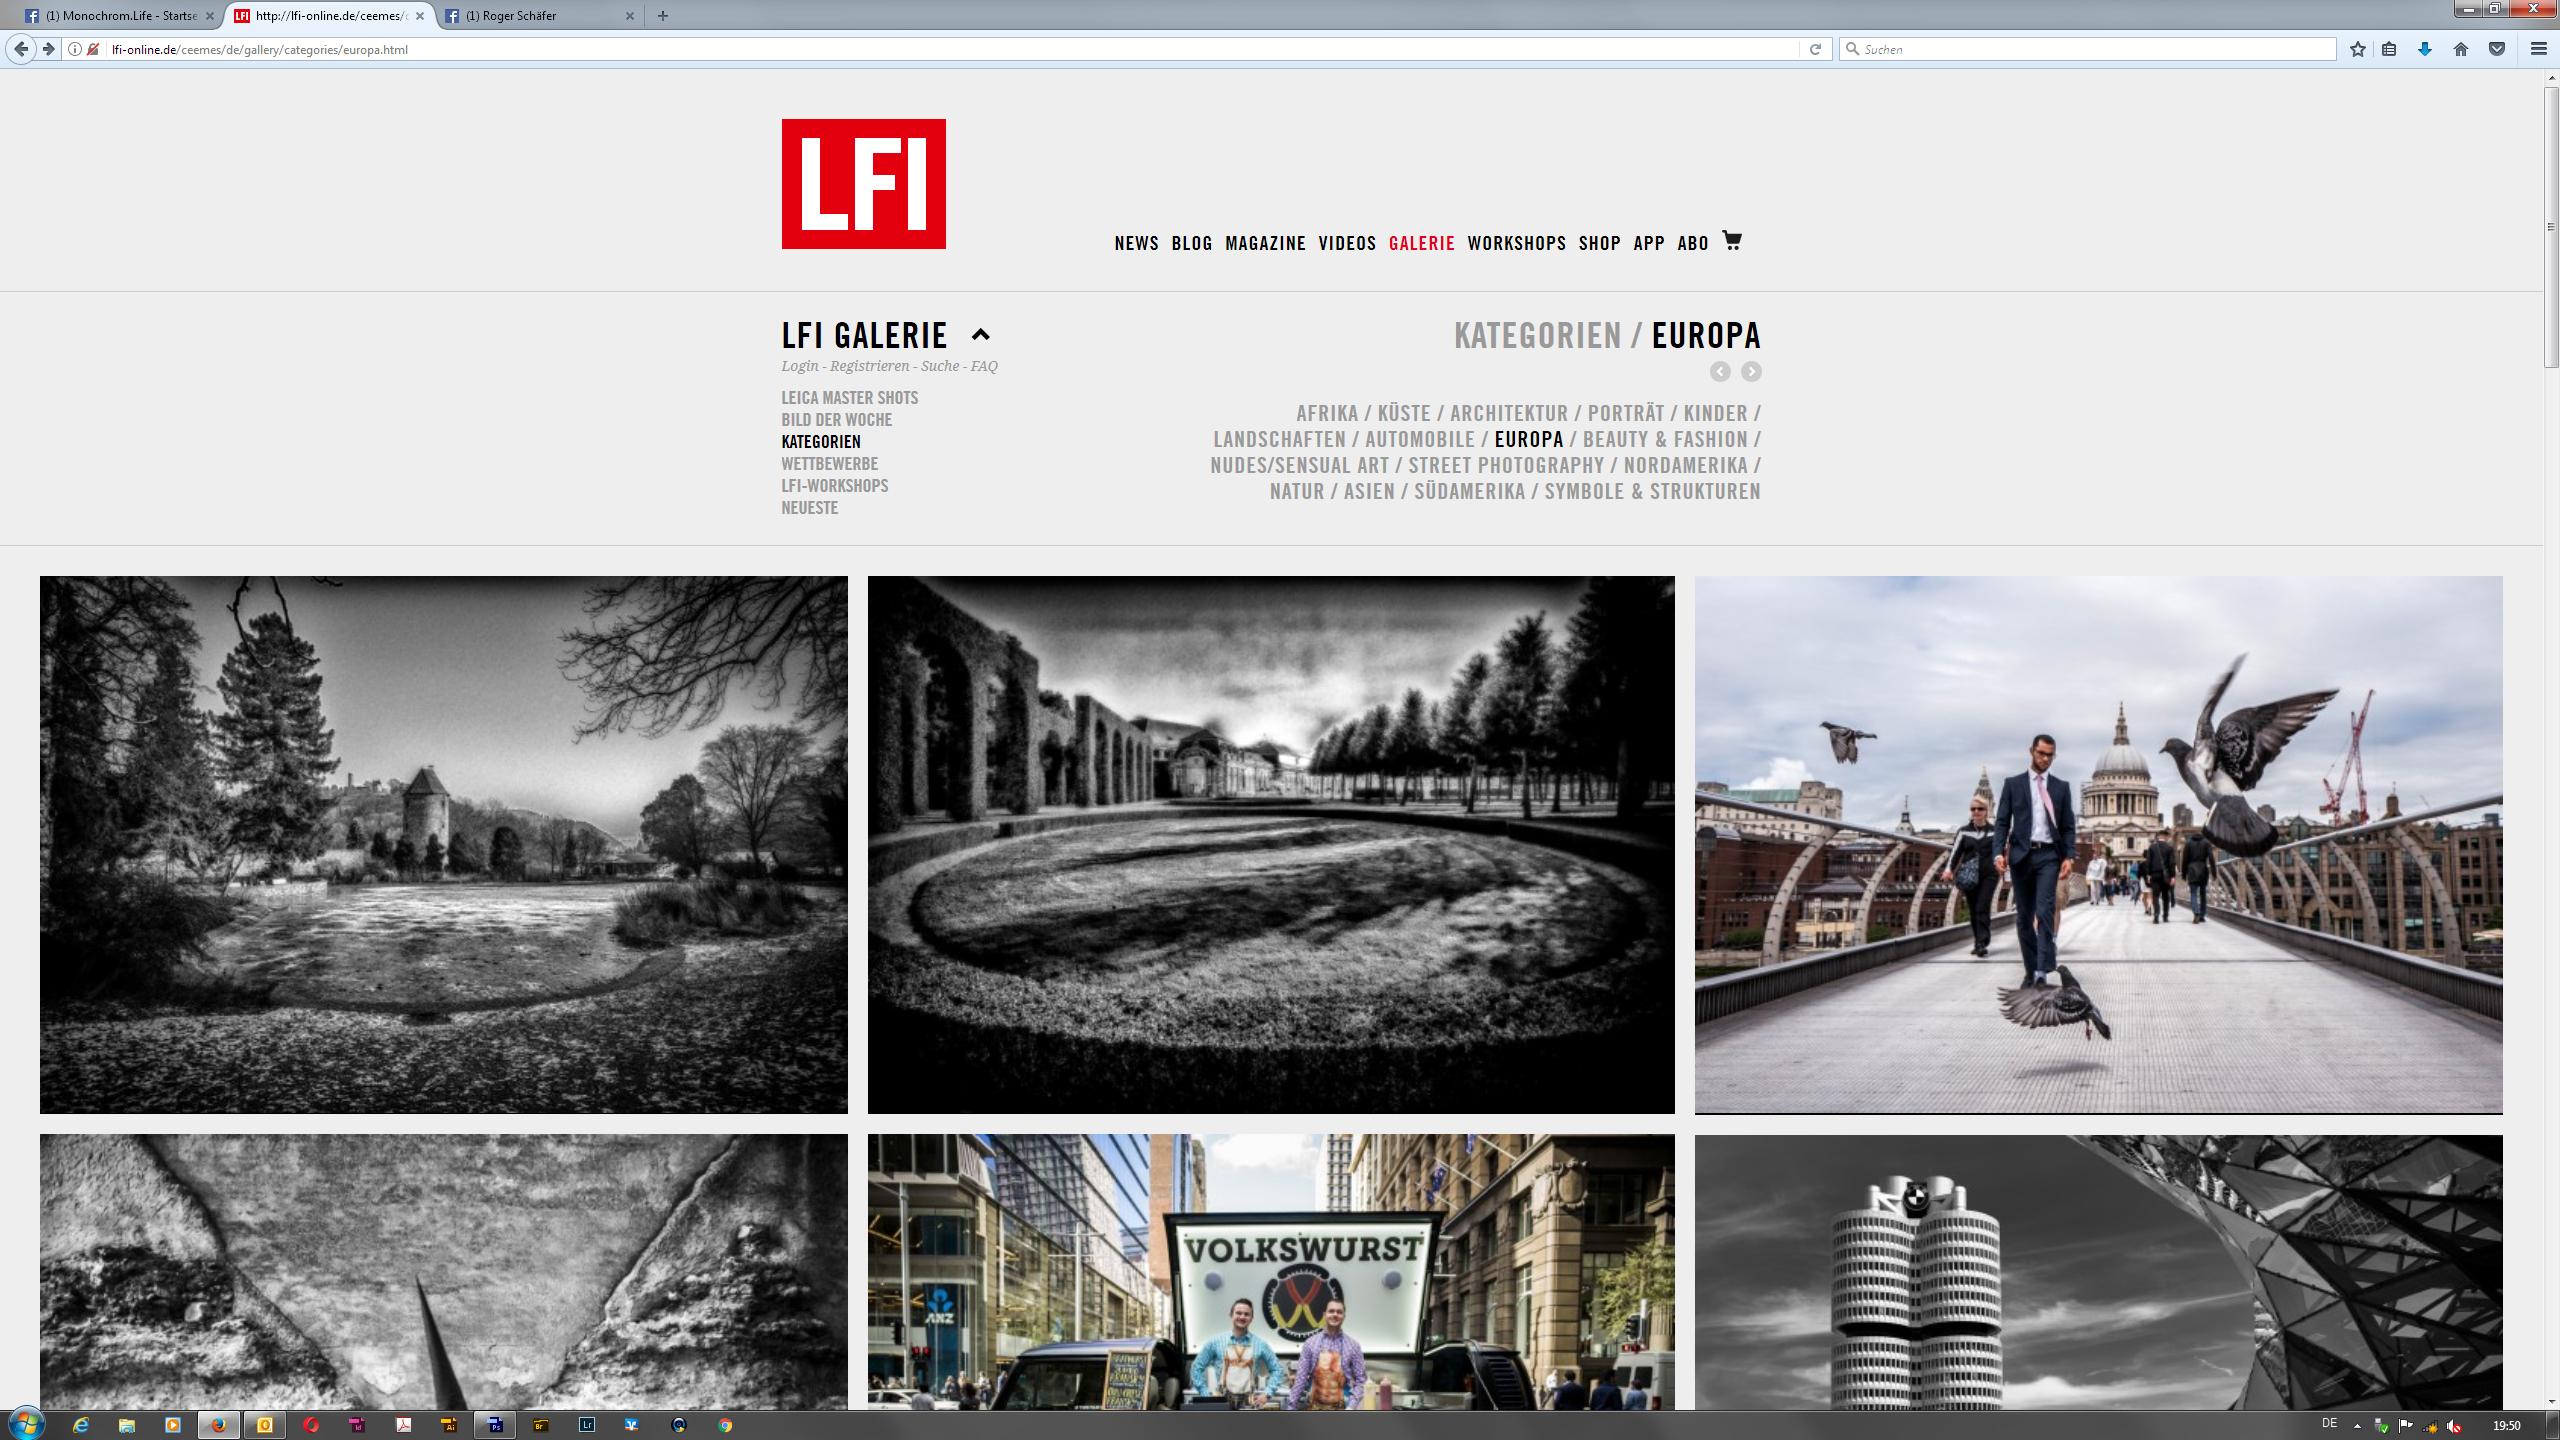 LFI_Europa02_07_2017 by .